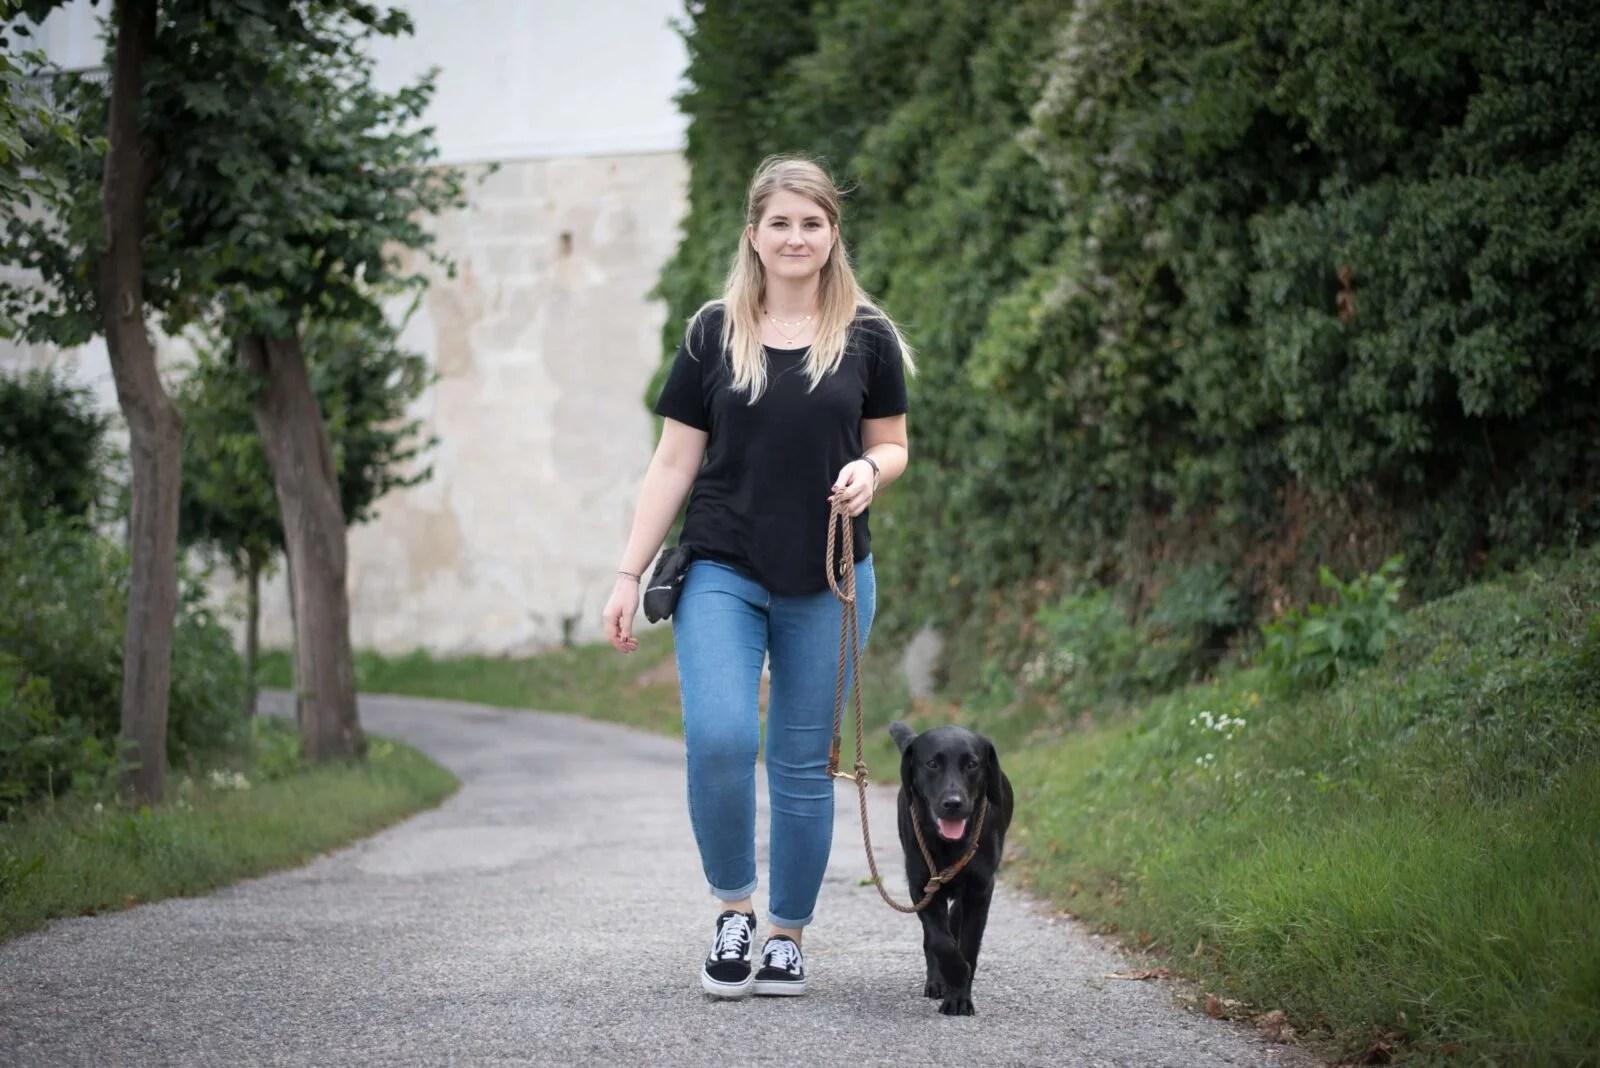 vollzeit4beiner-hundetraining-socialwalk-social-walk-hundeschule-linz-land-oberoesterreich-steyr-wels-hund